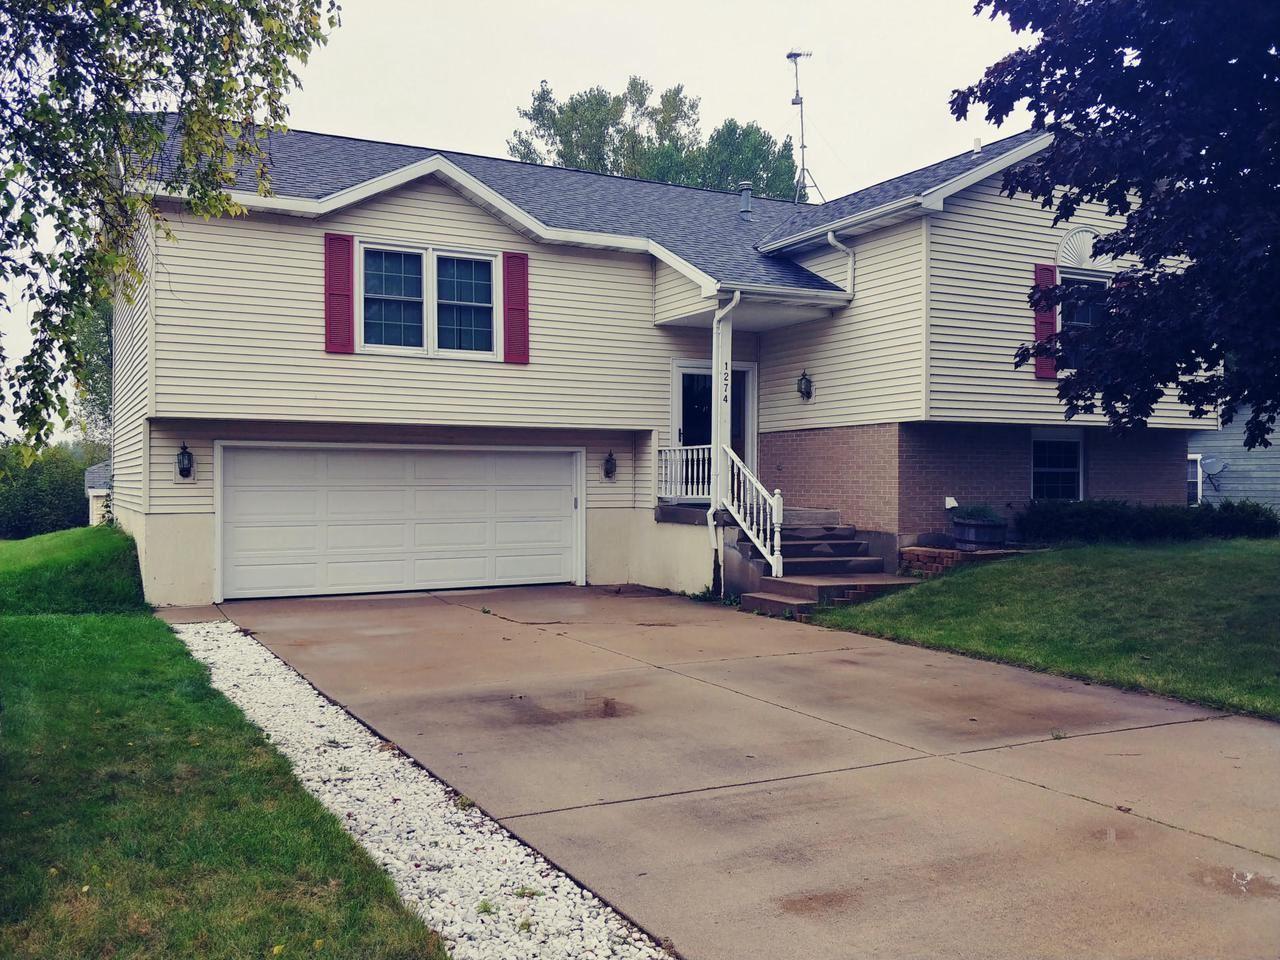 1274 Dayton St, Mayville, WI 53050 - MLS#: 1710088